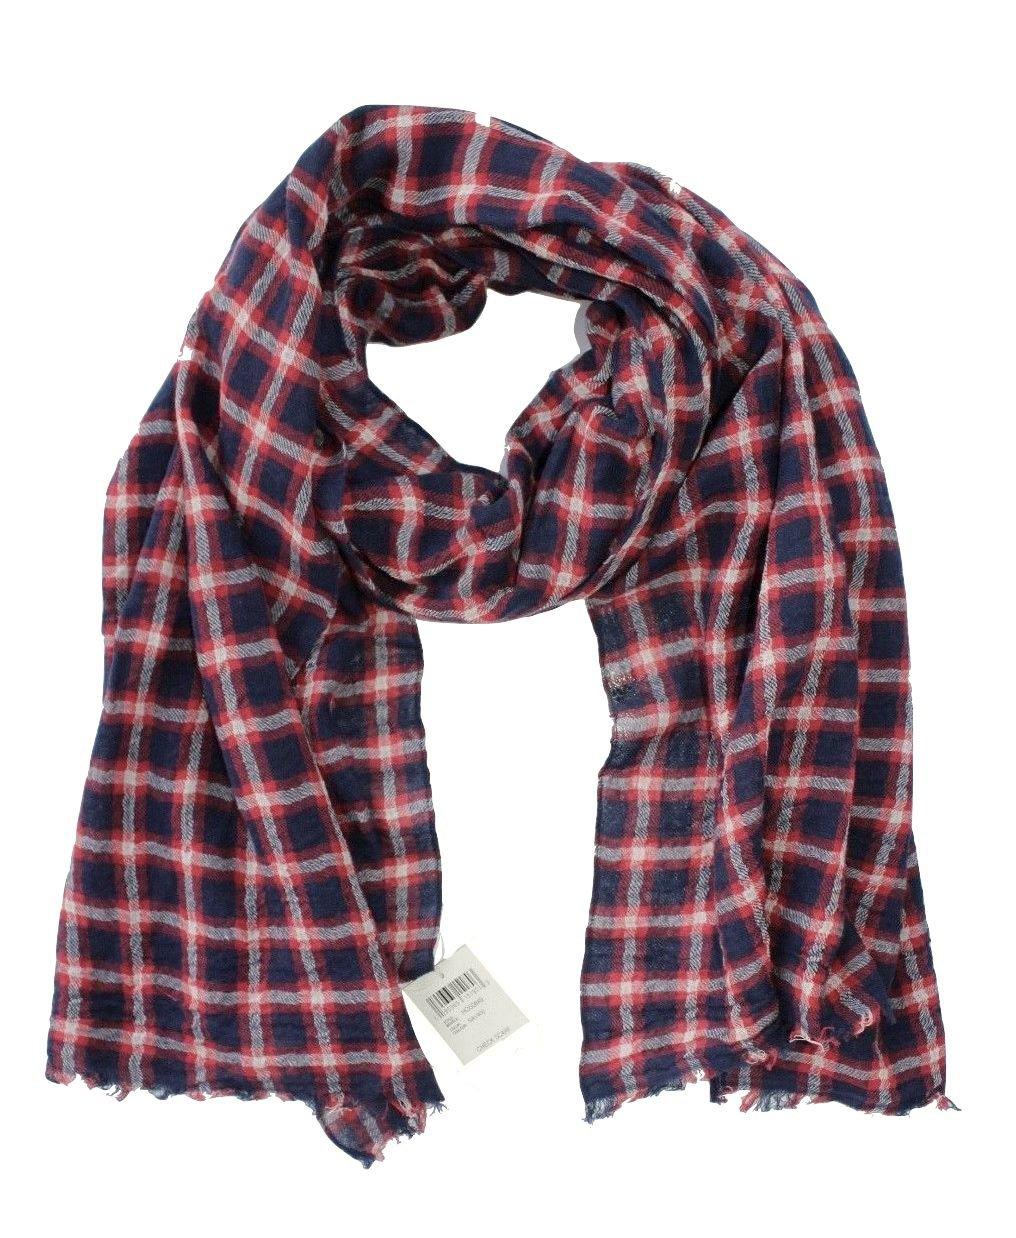 Lucky Brand - Men's - Wool/Cotton Windowpane Check Plaid Scarf